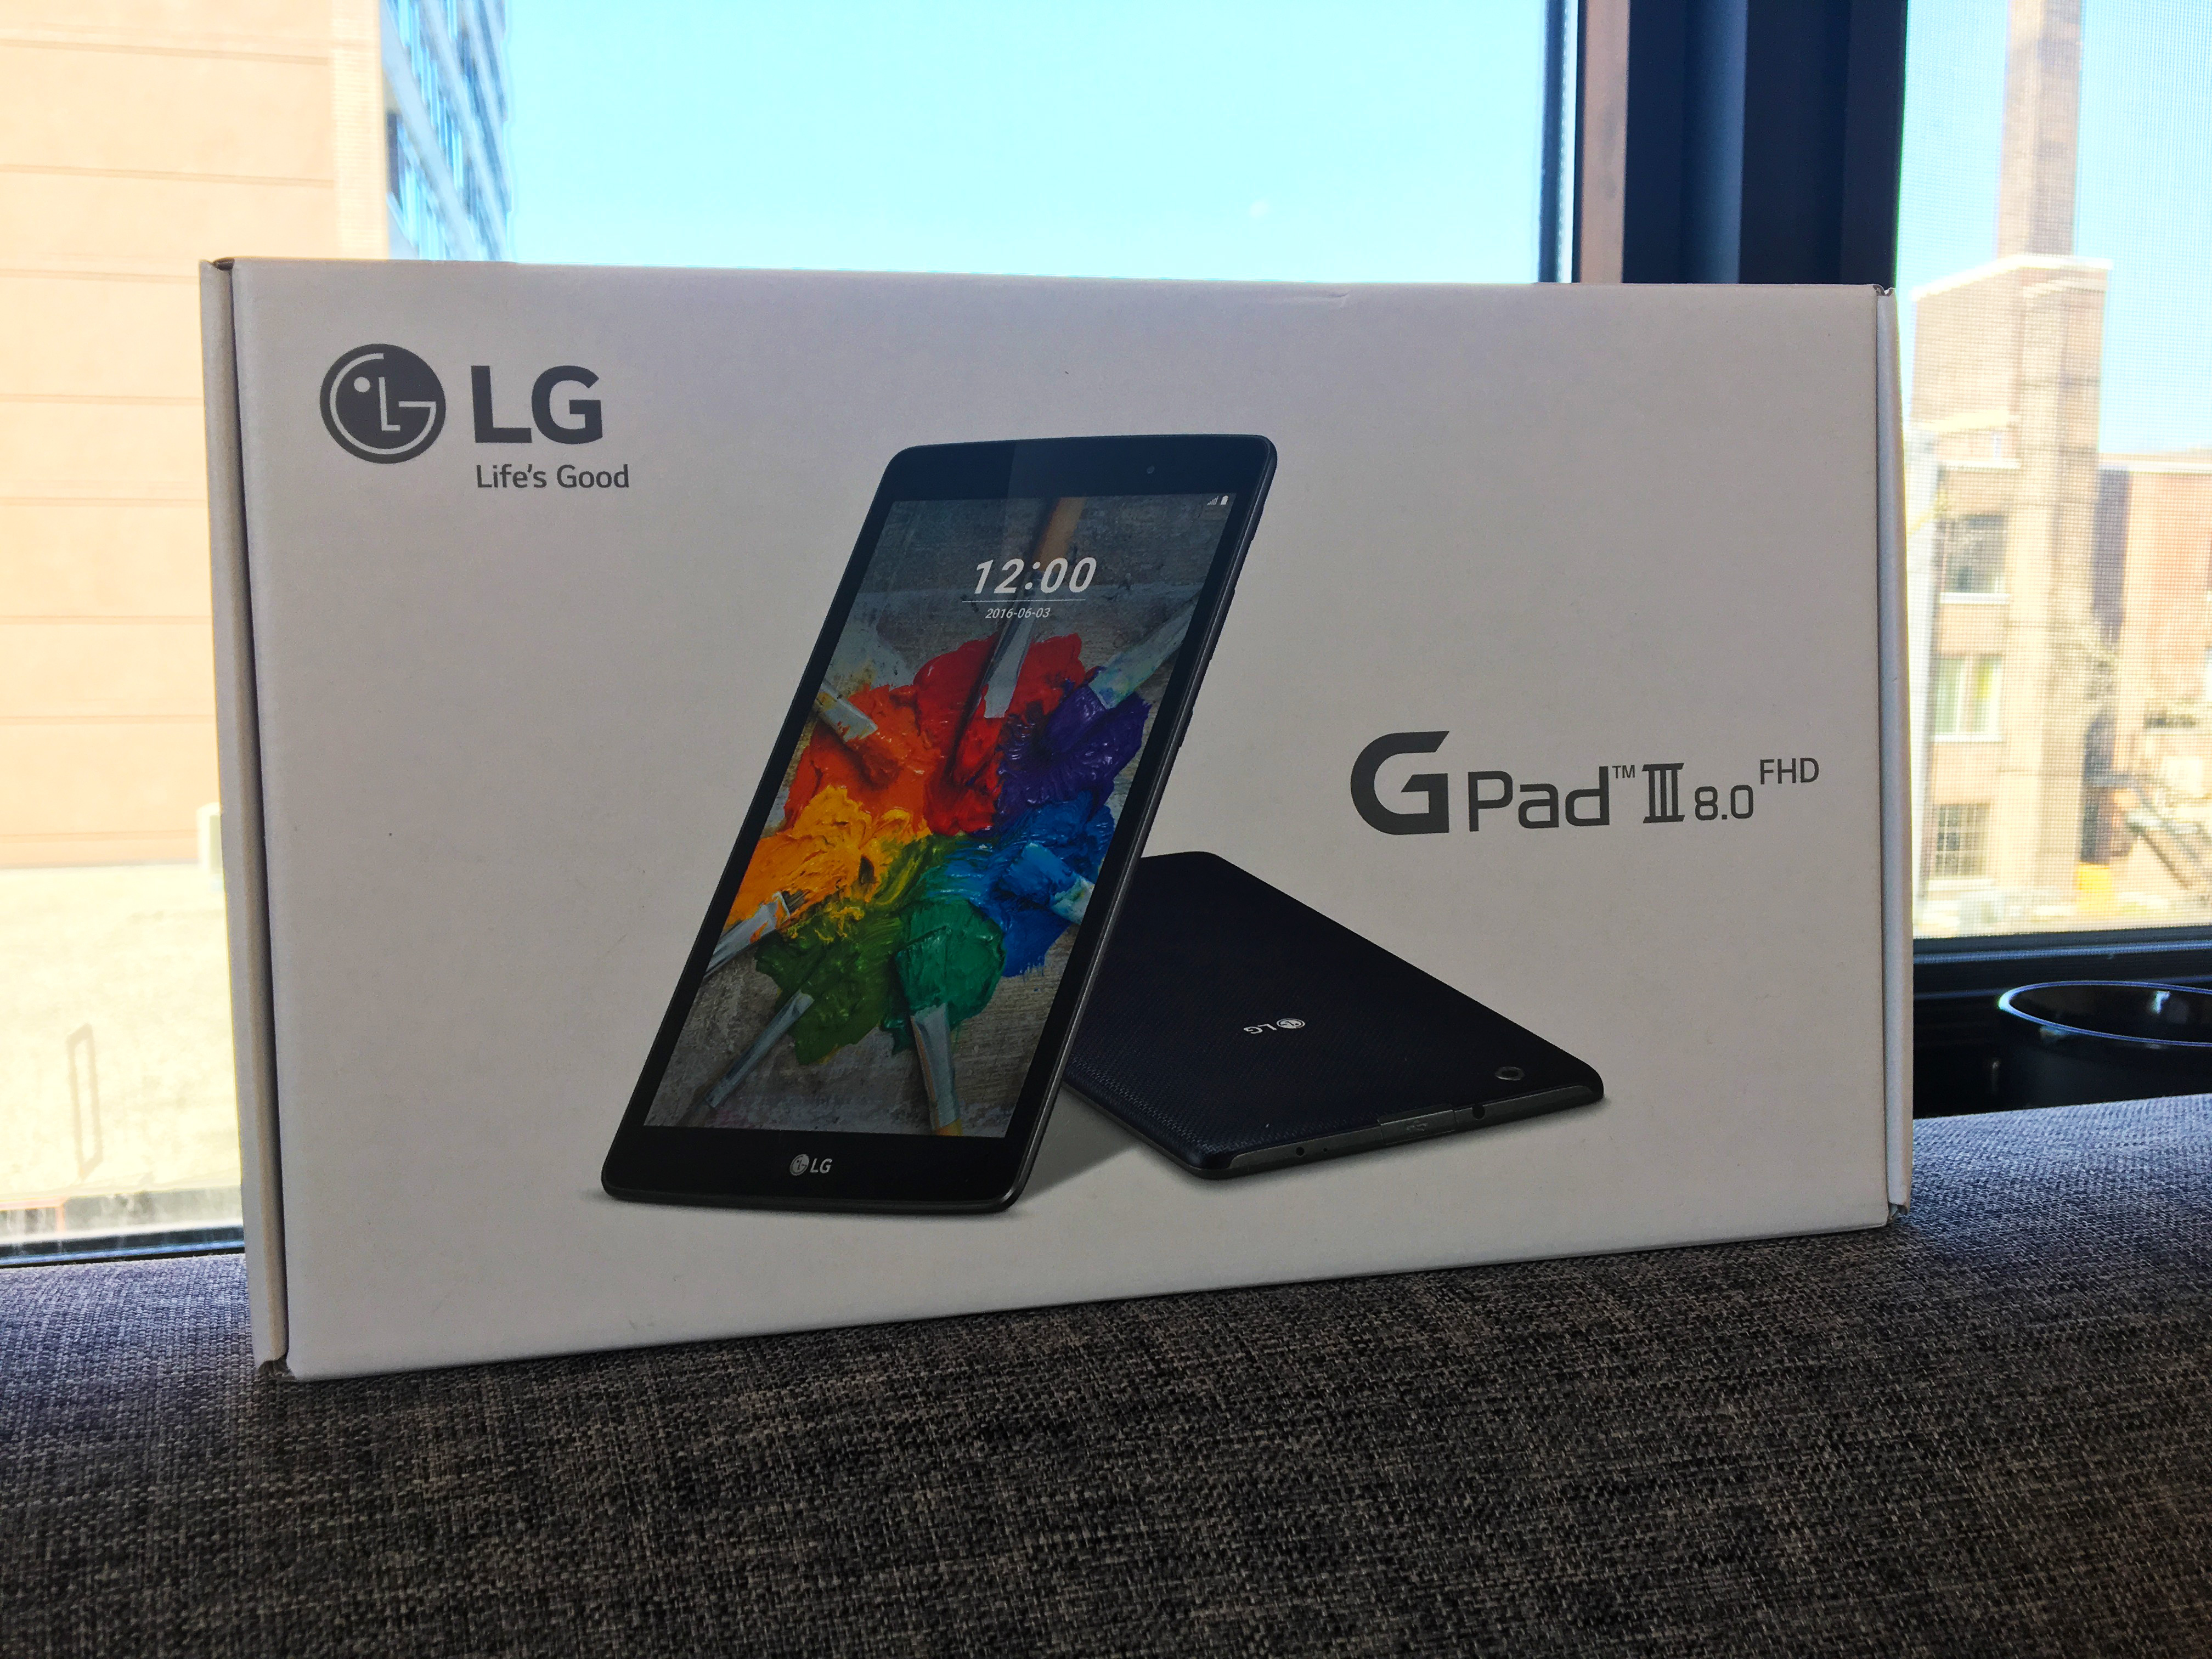 LG G Pad III 8.0 tablet box